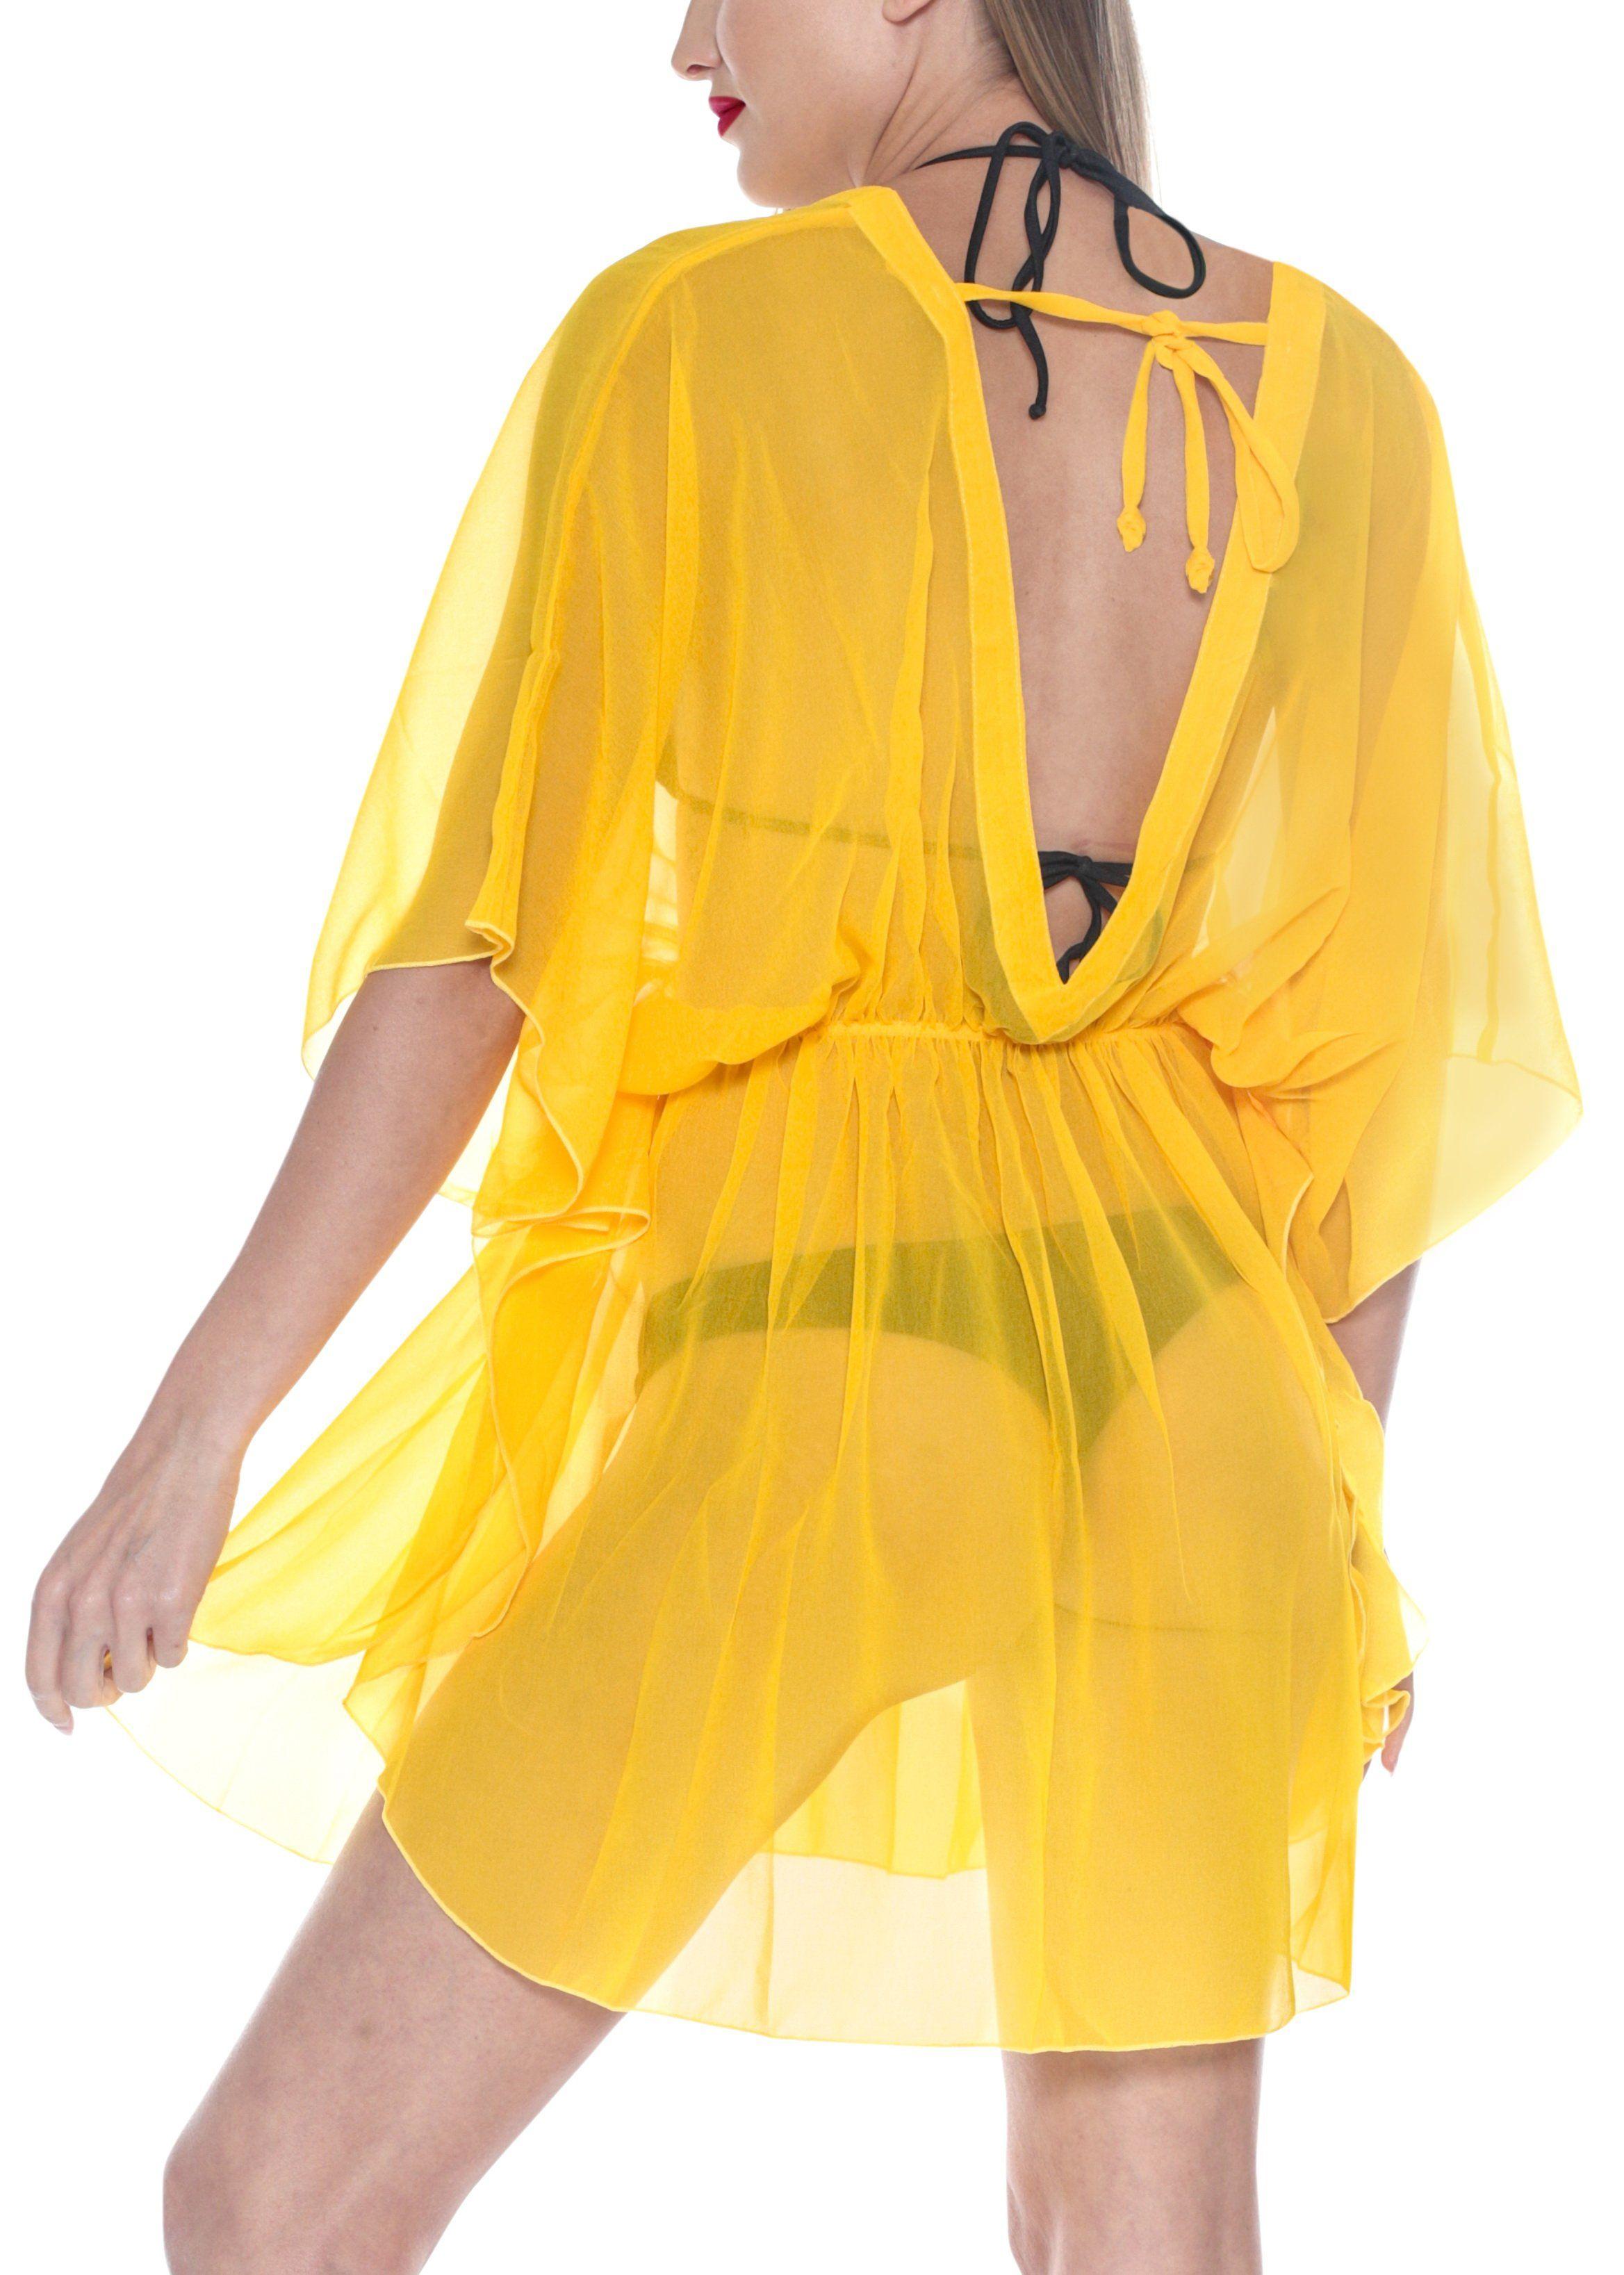 e5c79d7b04d37 LA LEELA Bikni Swimwear Chiffon Solid Blouse Cover Ups Women OSFM 8-16W [M-  1X] Yellow_843